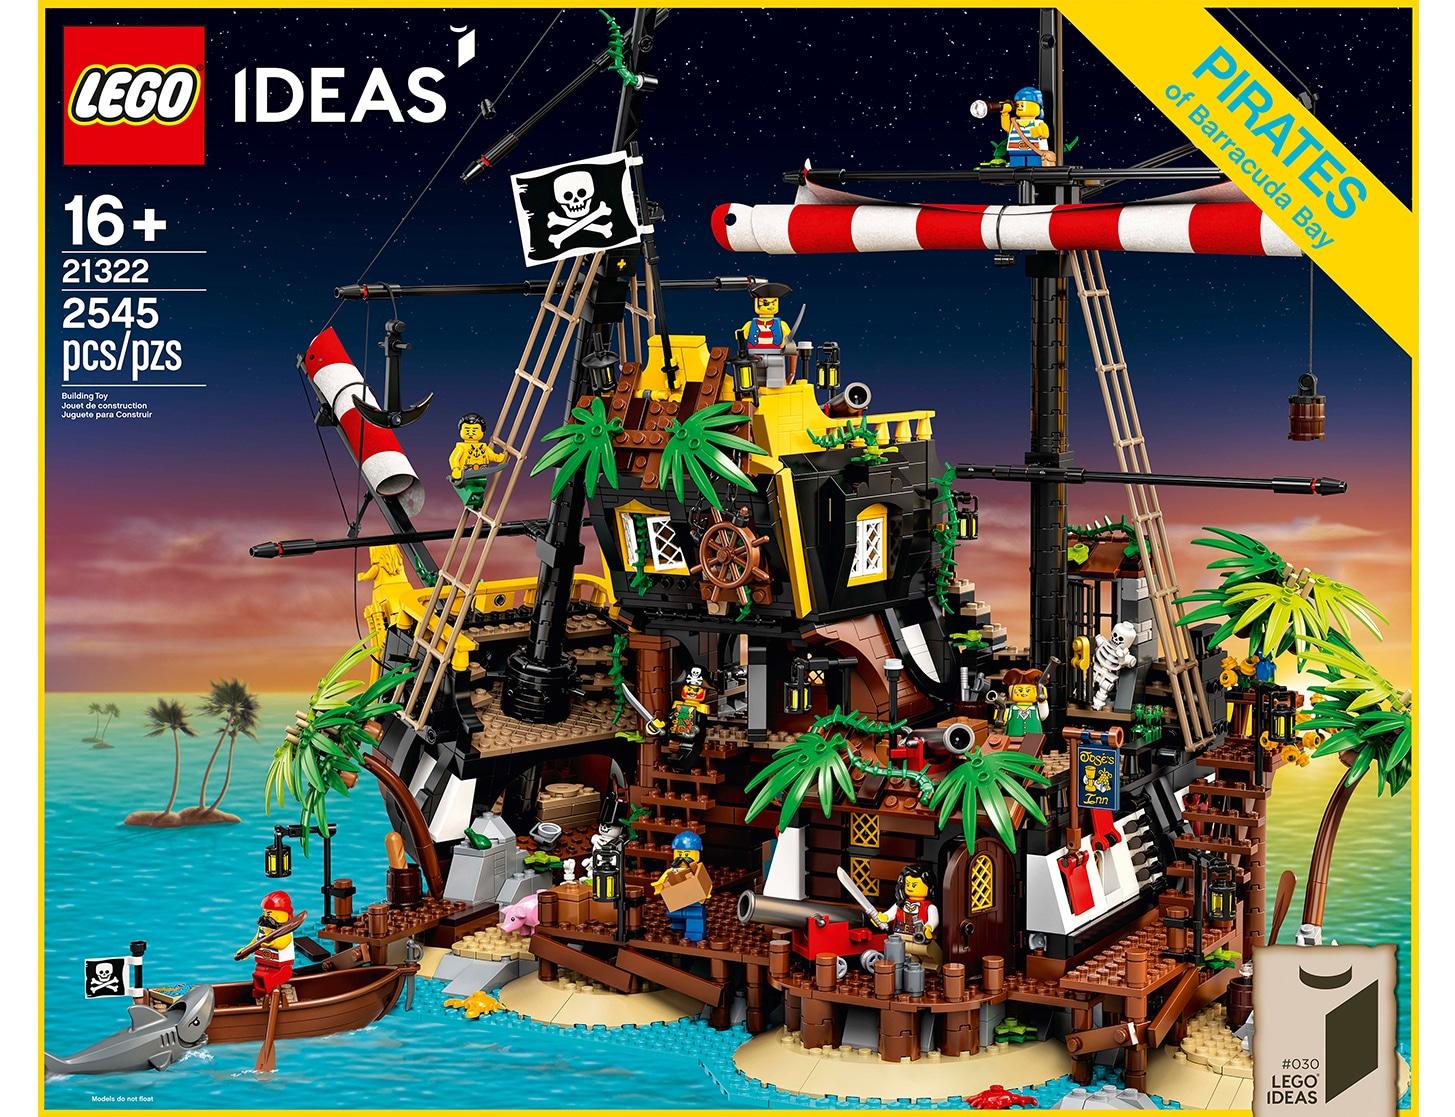 LEGO 21322 Pirates of Barracuda Bay Box Design